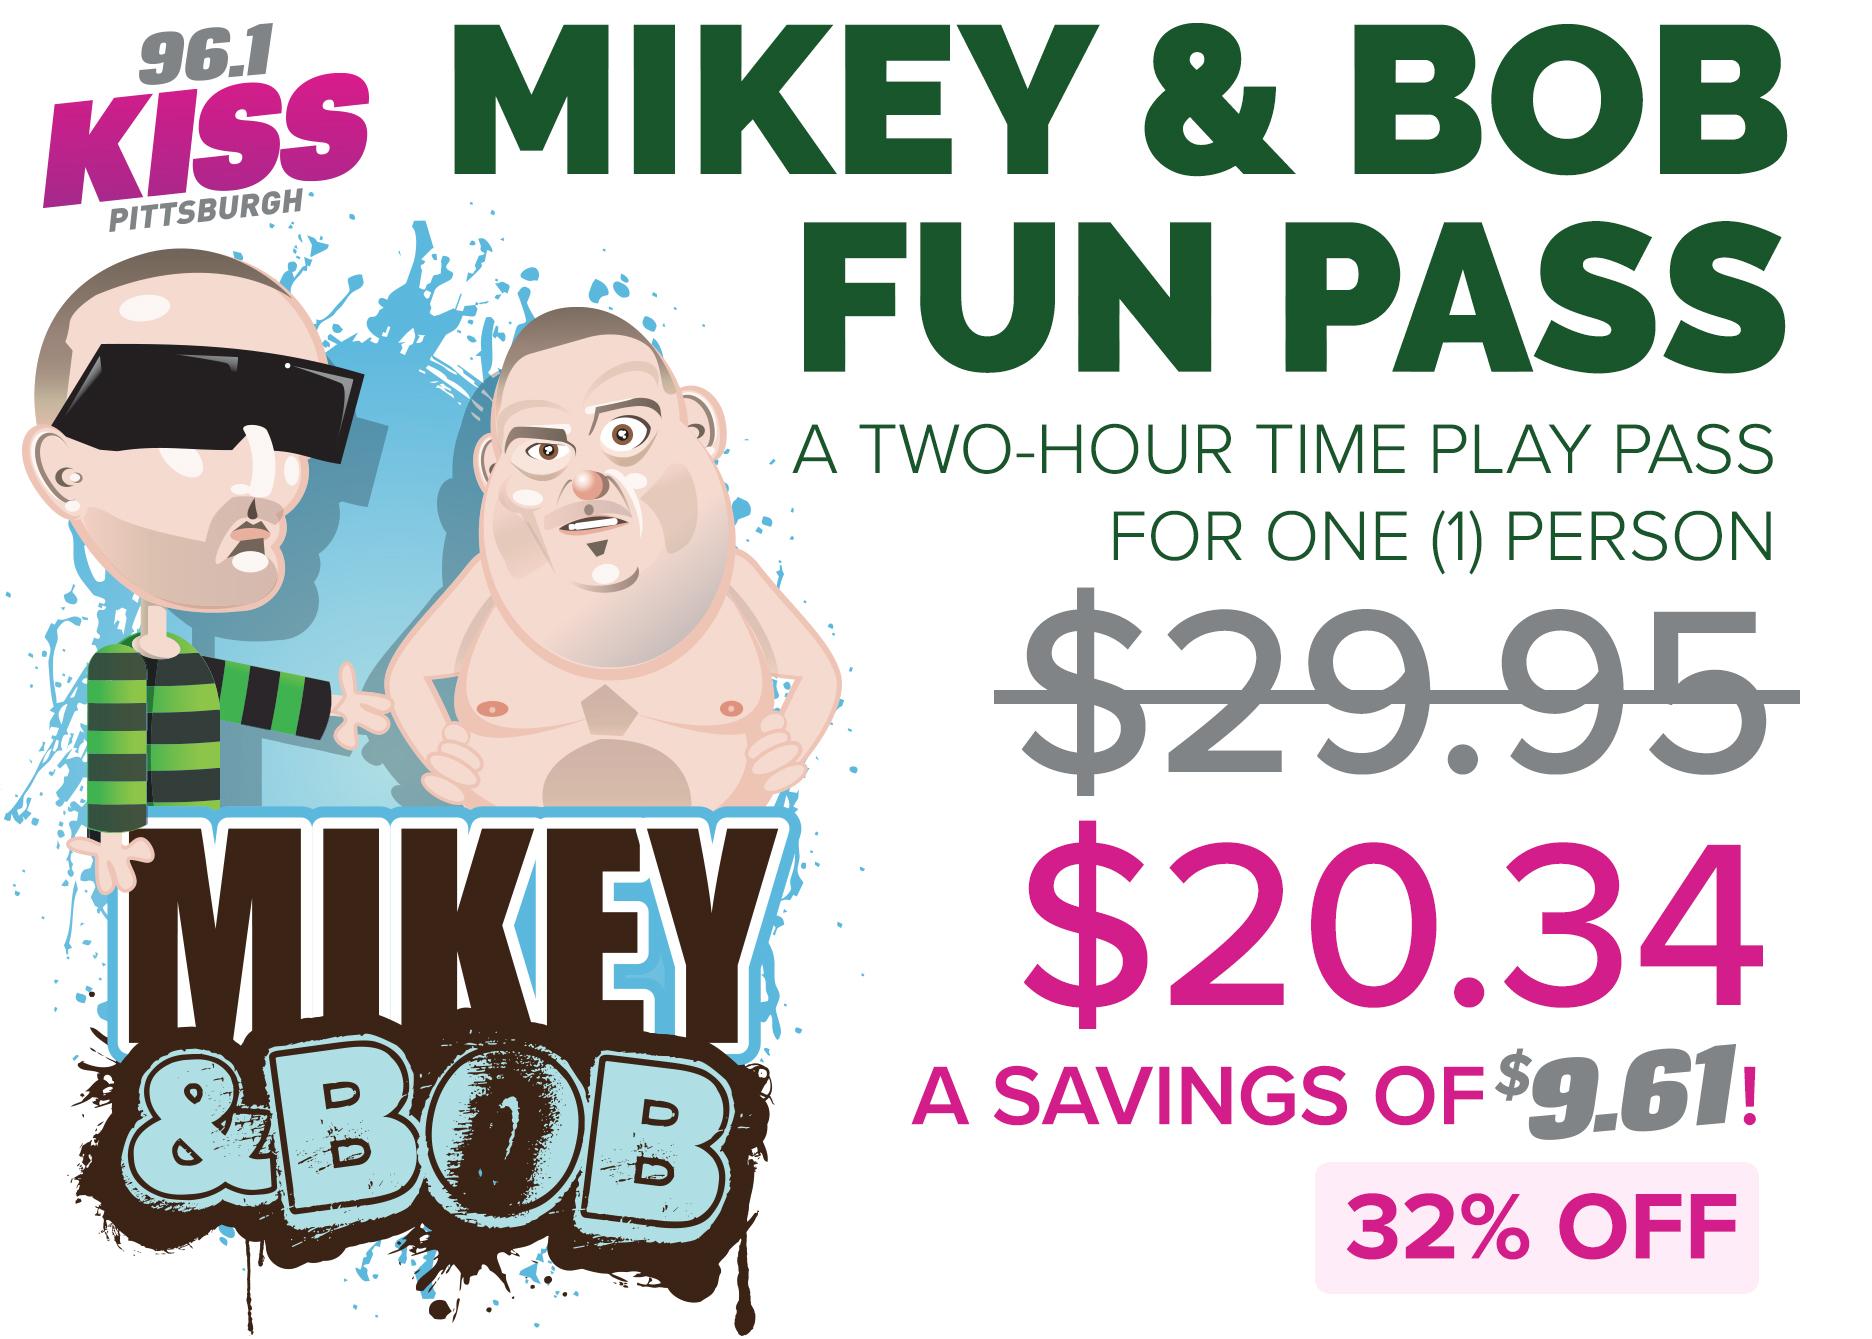 Mikey Bob Discount Ad.jpg